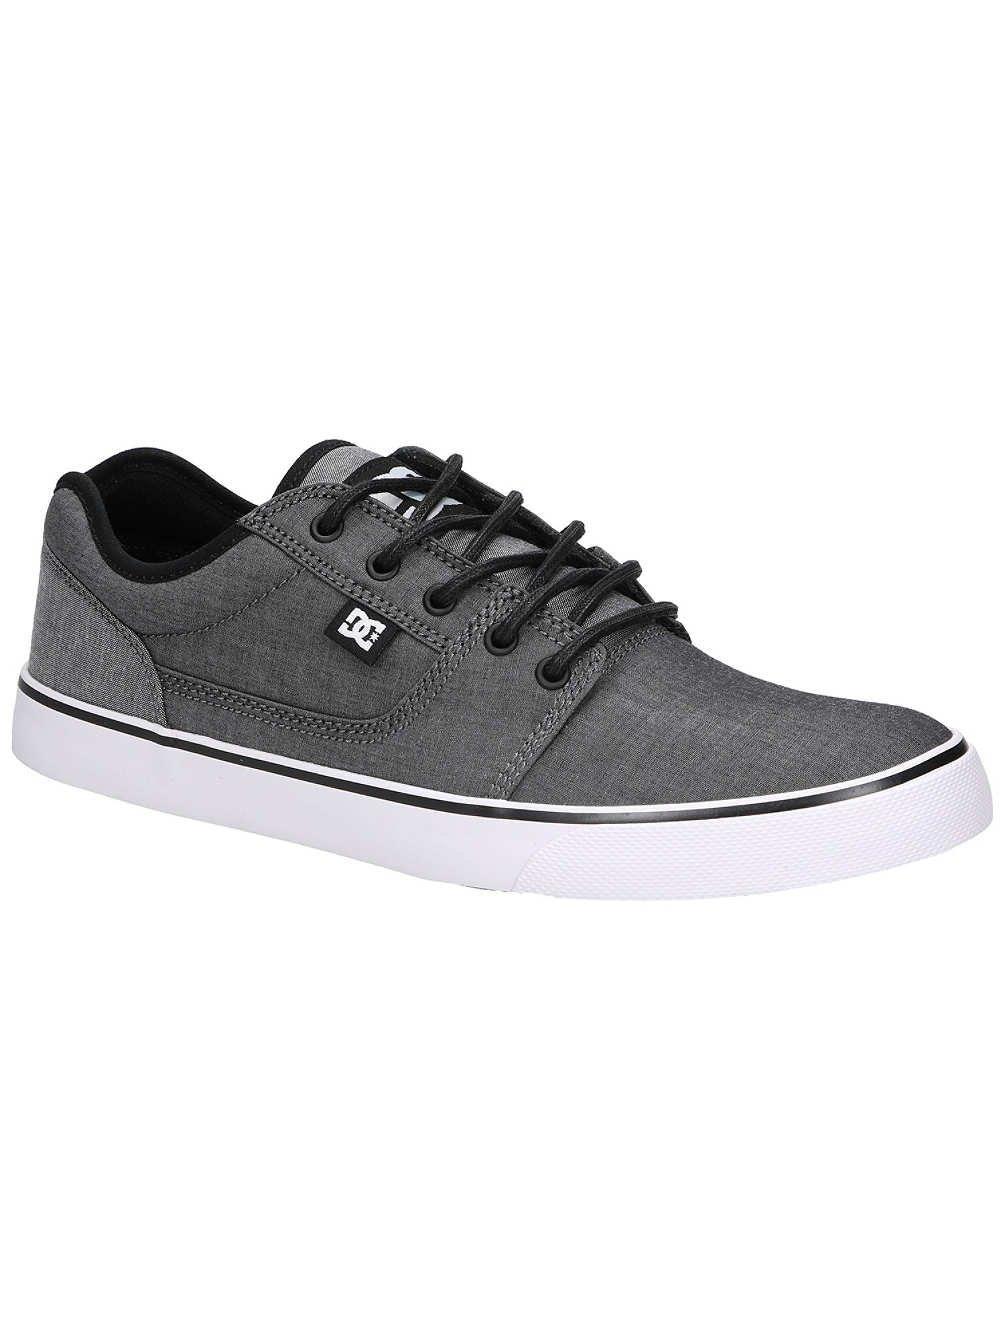 DC Shoes Tonik TX SE - Zapatillas Bajas para Hombre 40.5 EU|Chambray